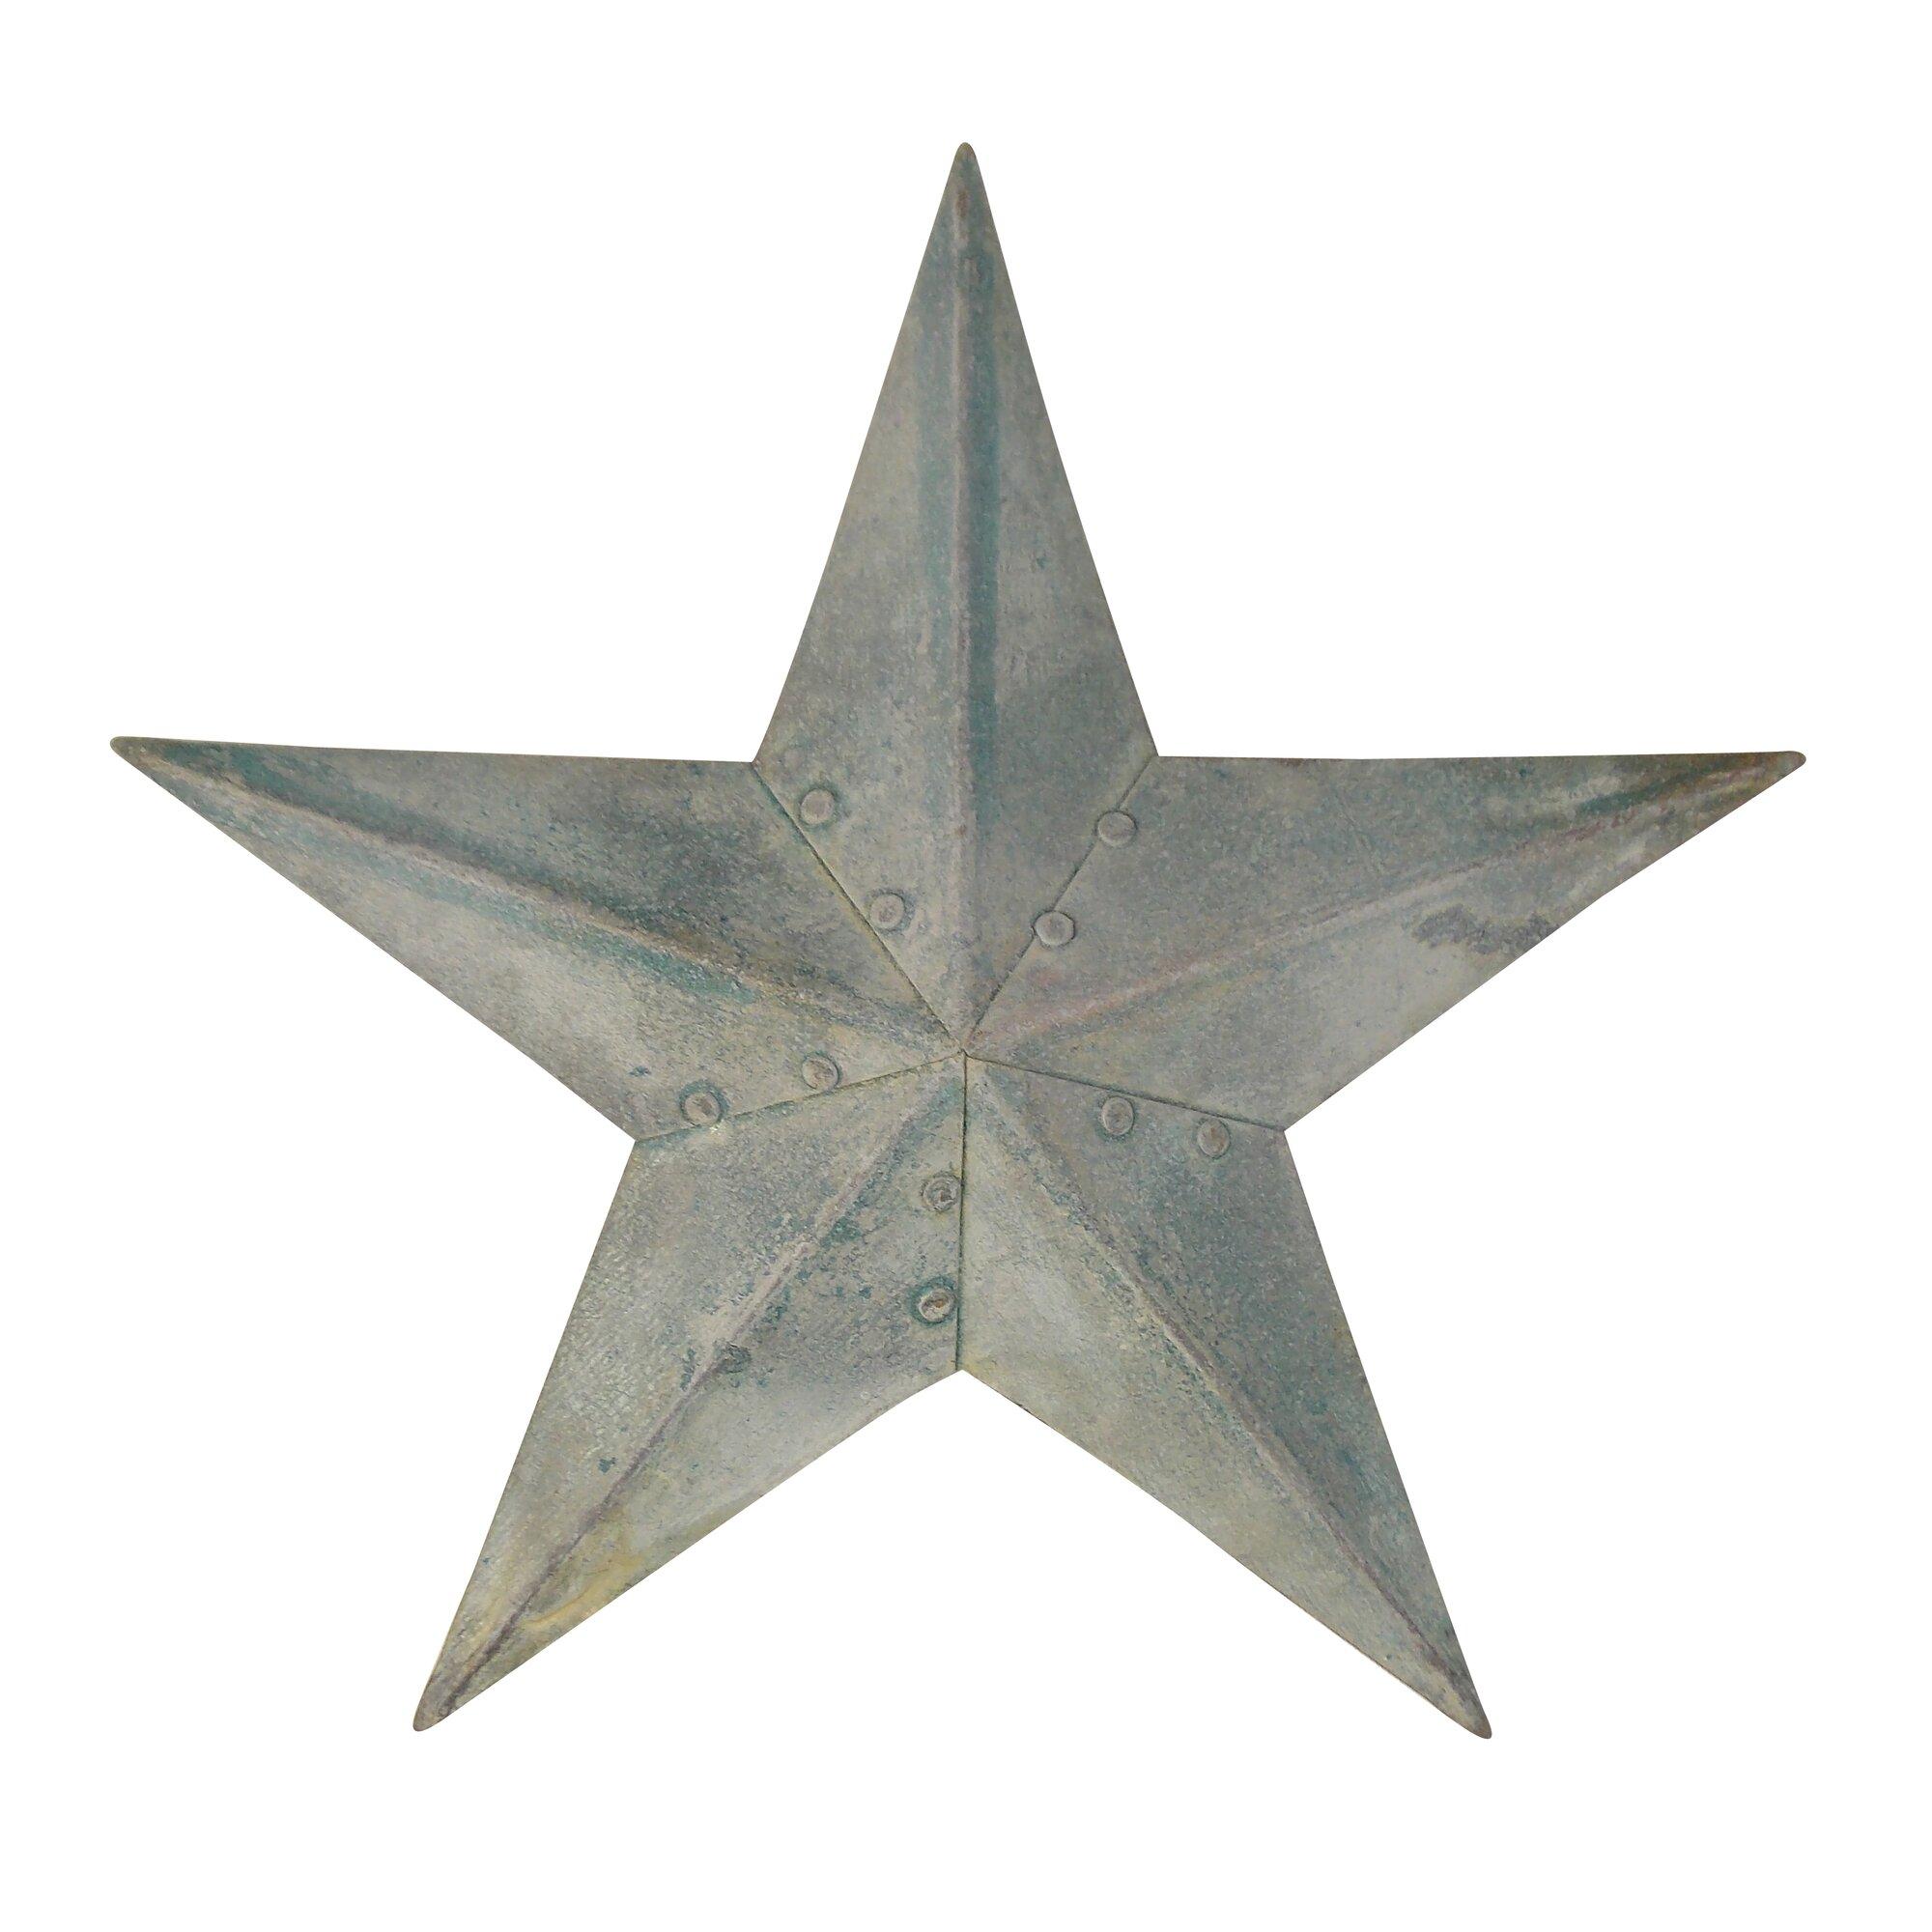 galvanized star wall dcor - Star Wall Decor